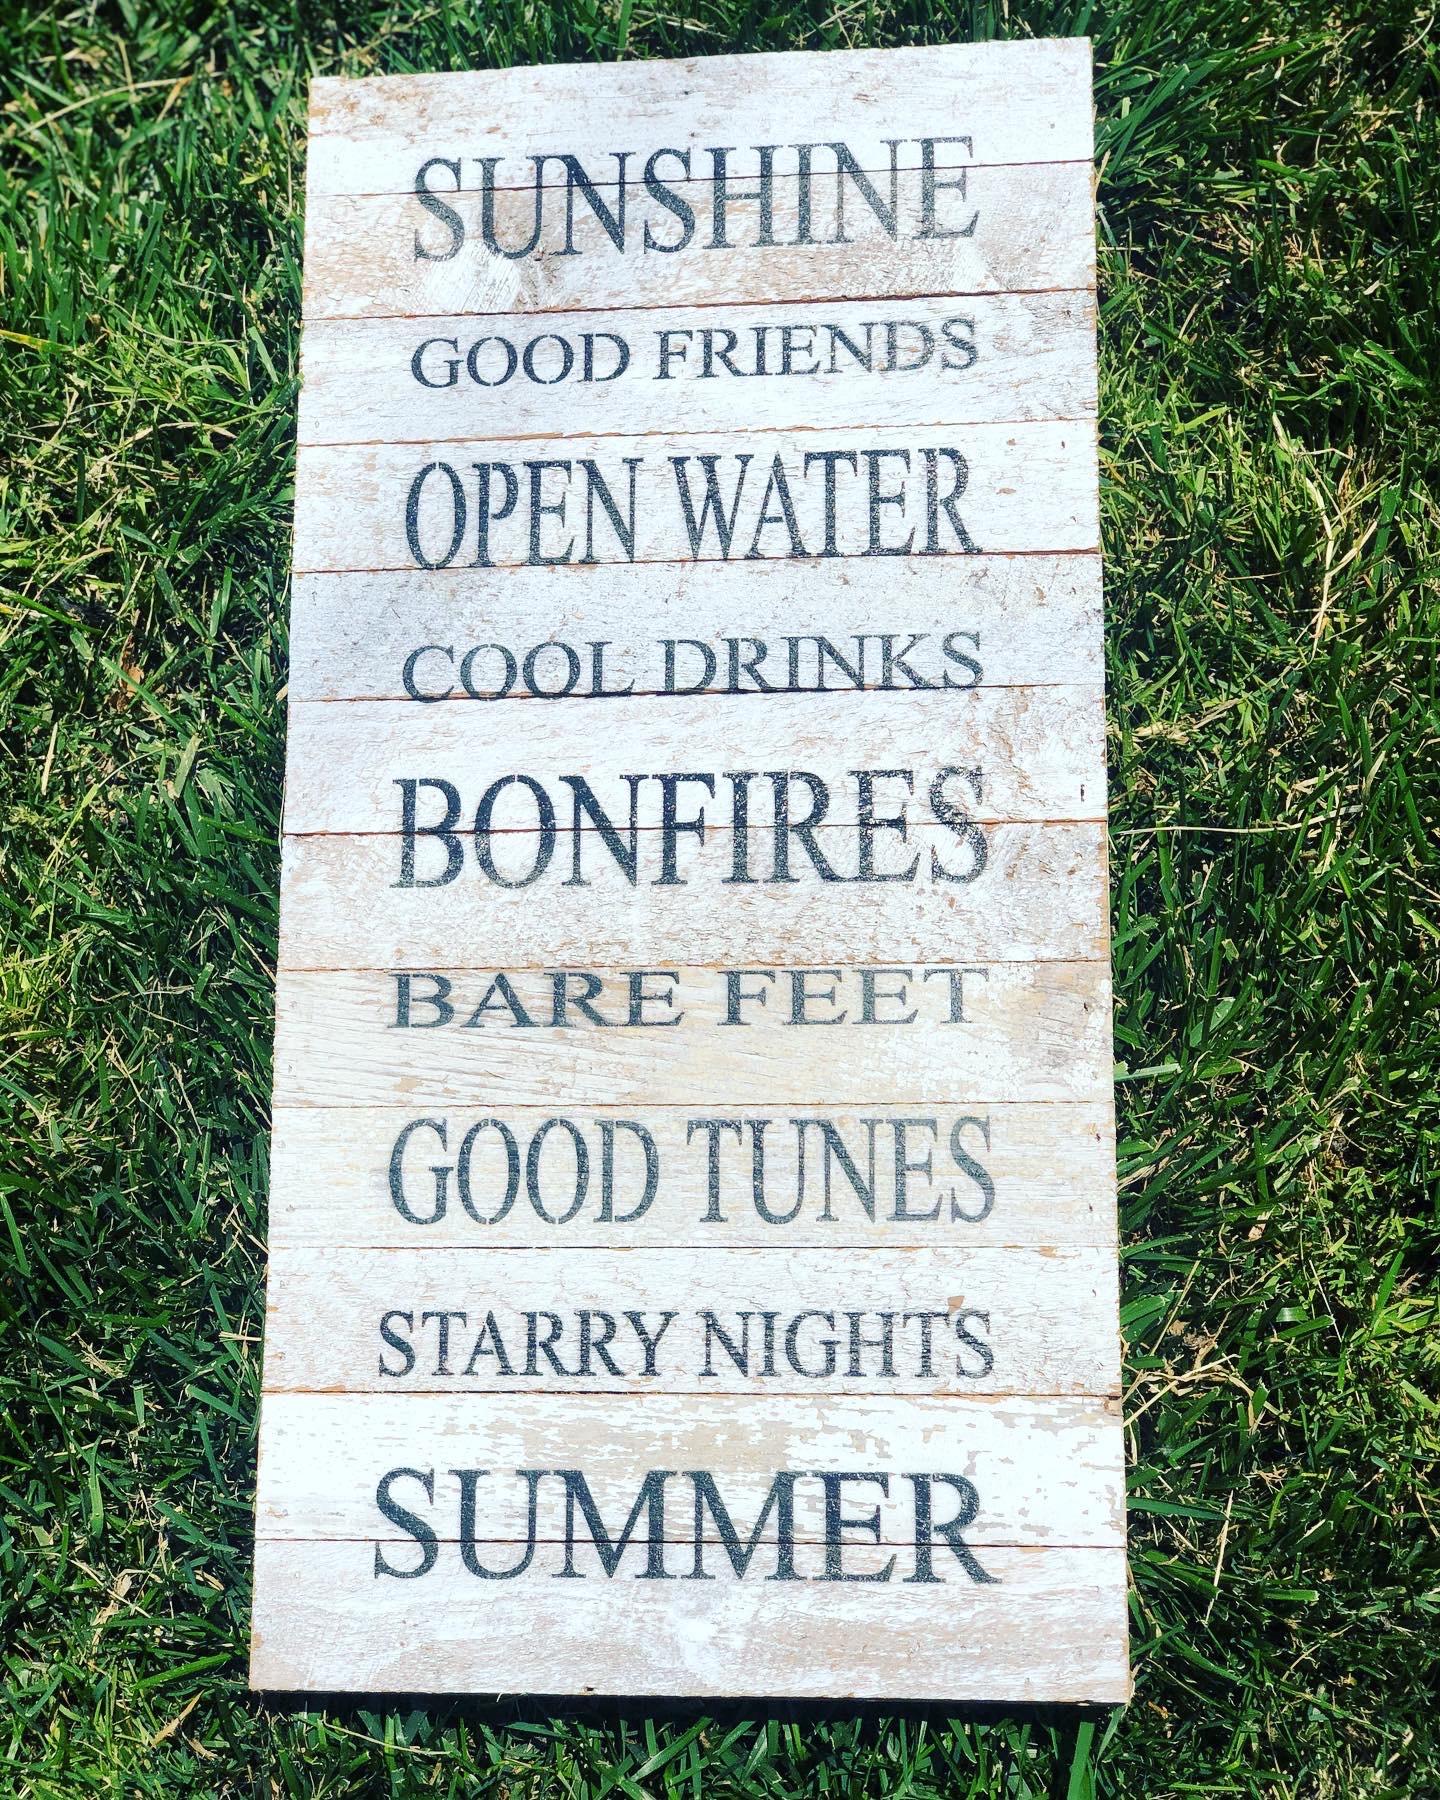 SN-Sunshine, good friends, open water ,cool drinks